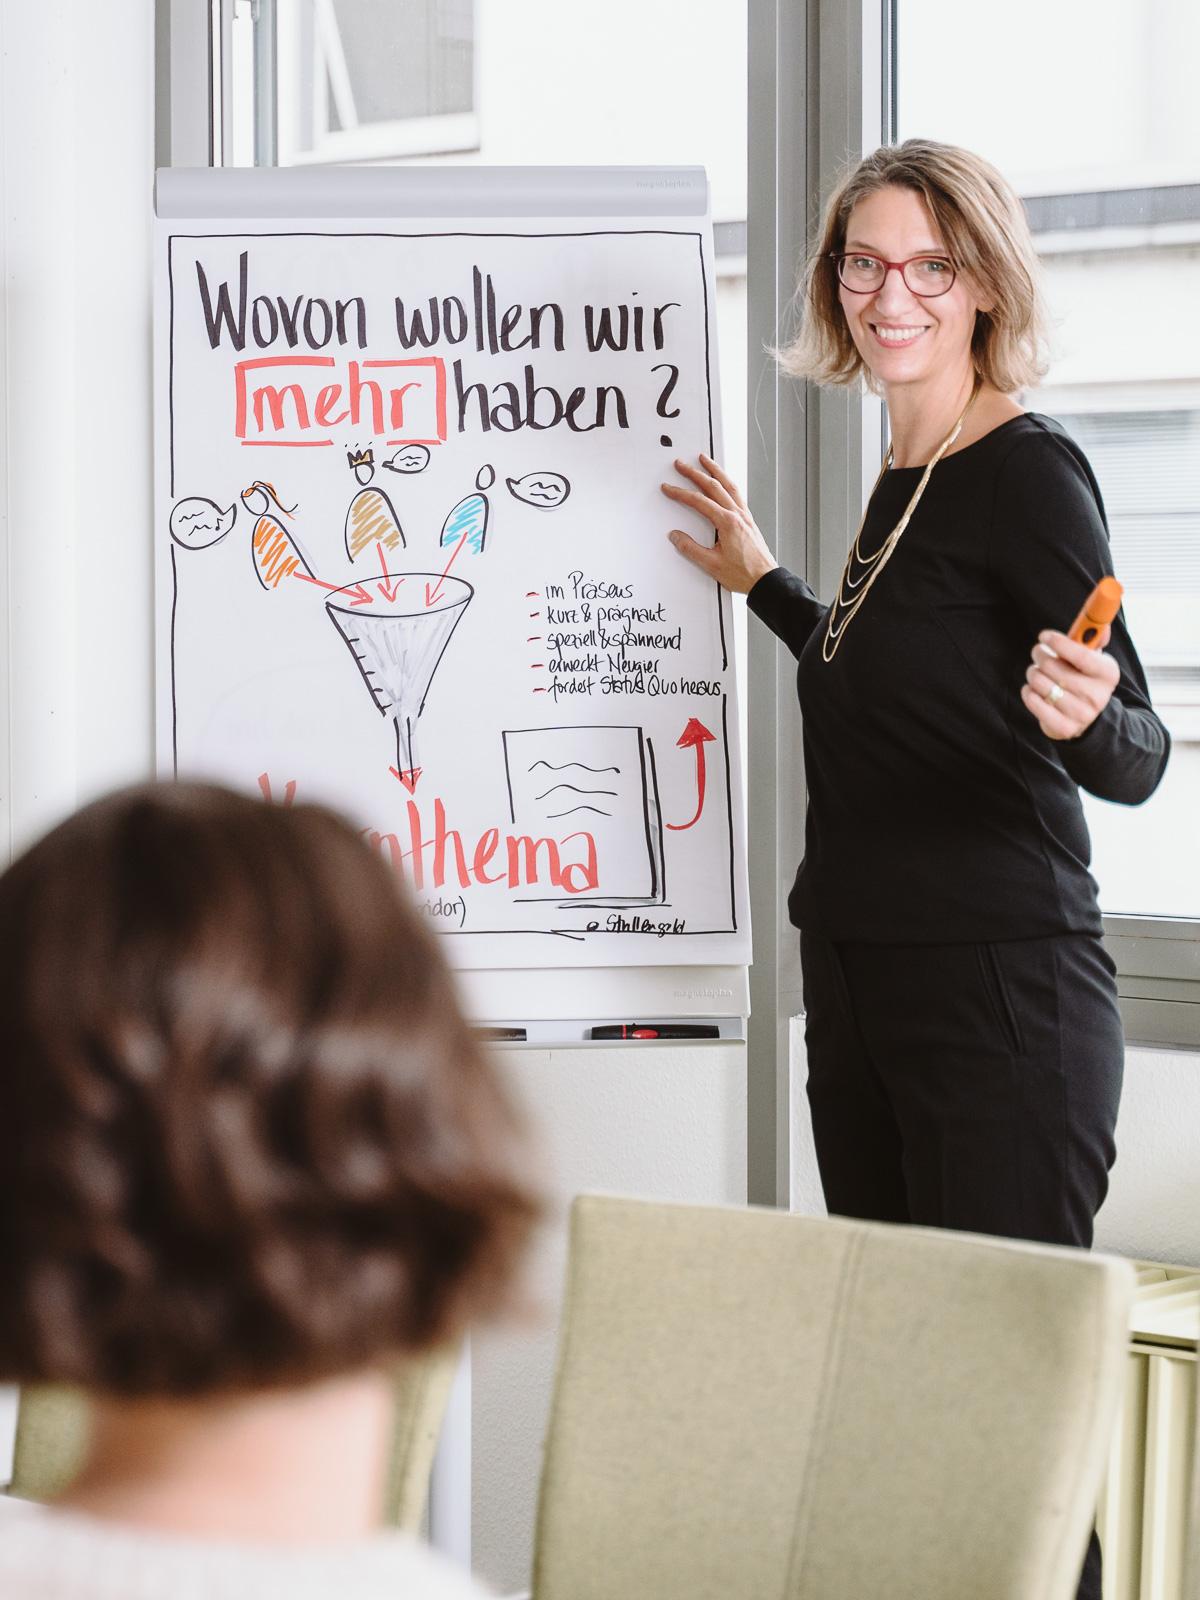 Coach lacht im Seminar - Businessporträts Fotograf Bonn